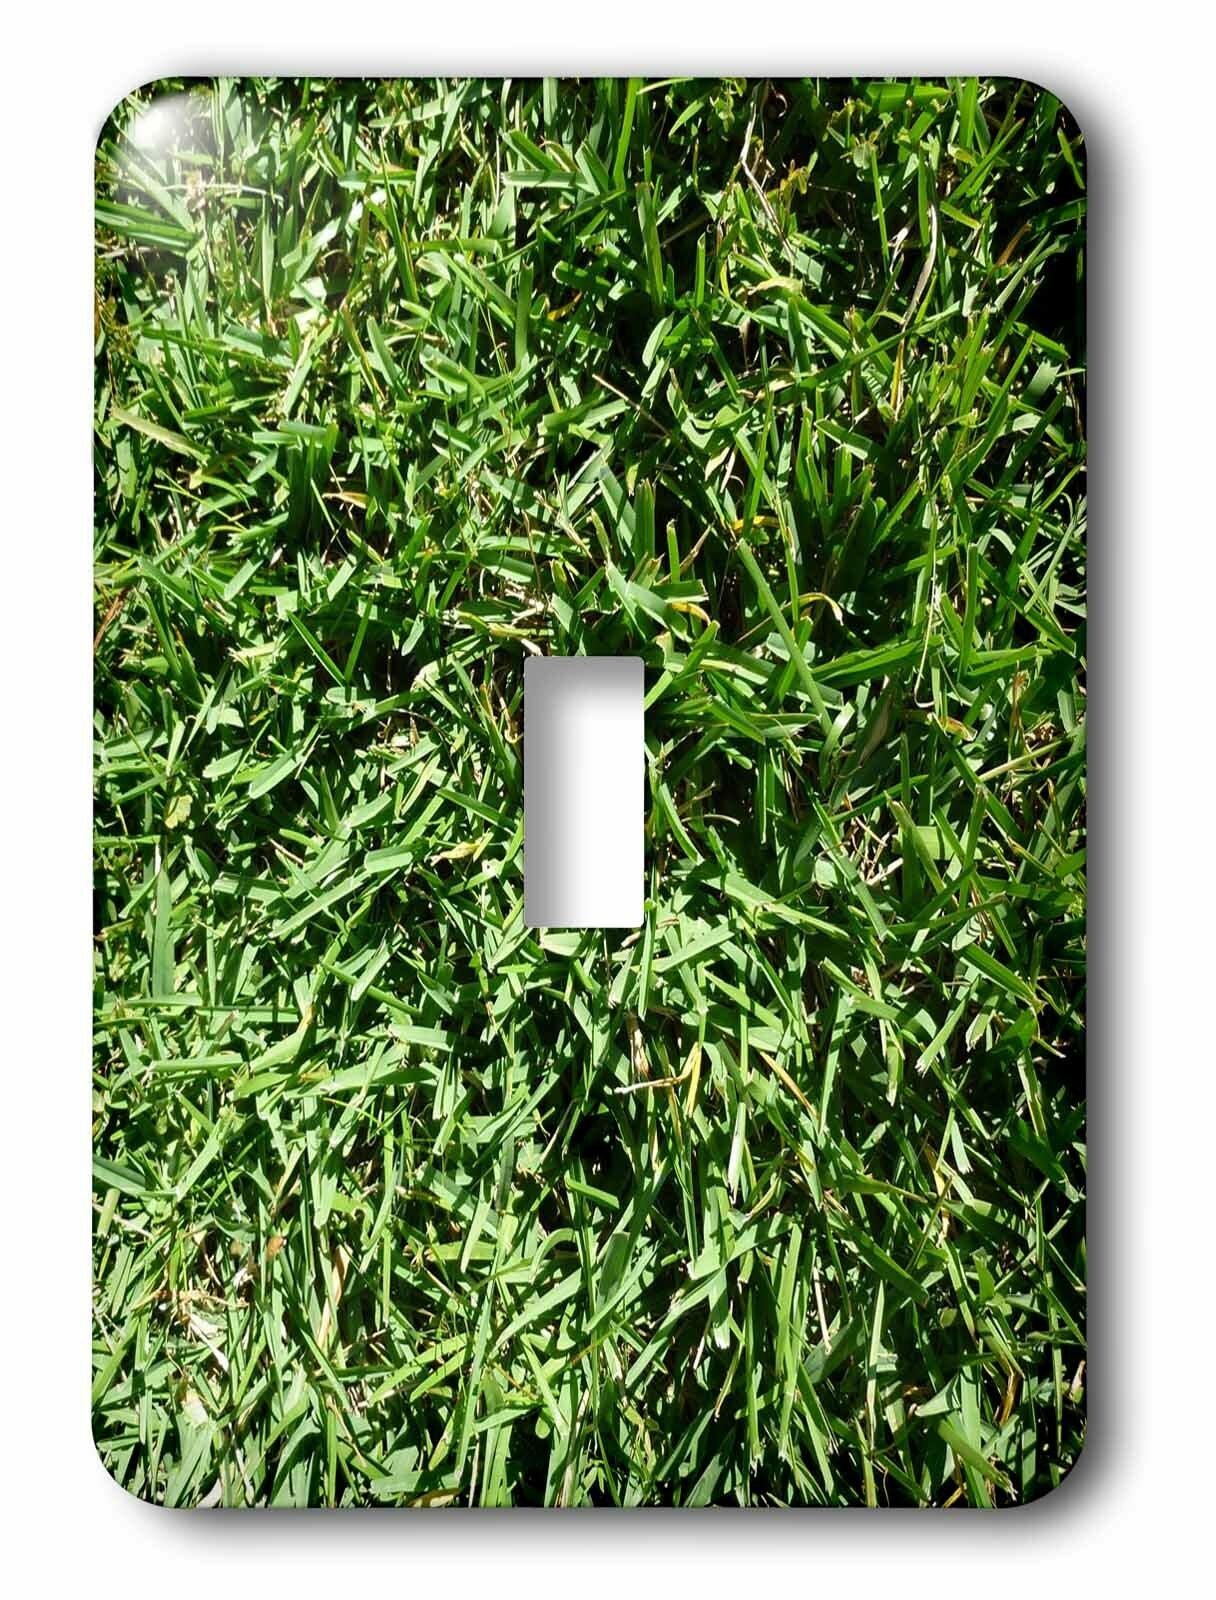 3drose Switch Grass 1 Gang Toggle Light Switch Wall Plate Wayfair